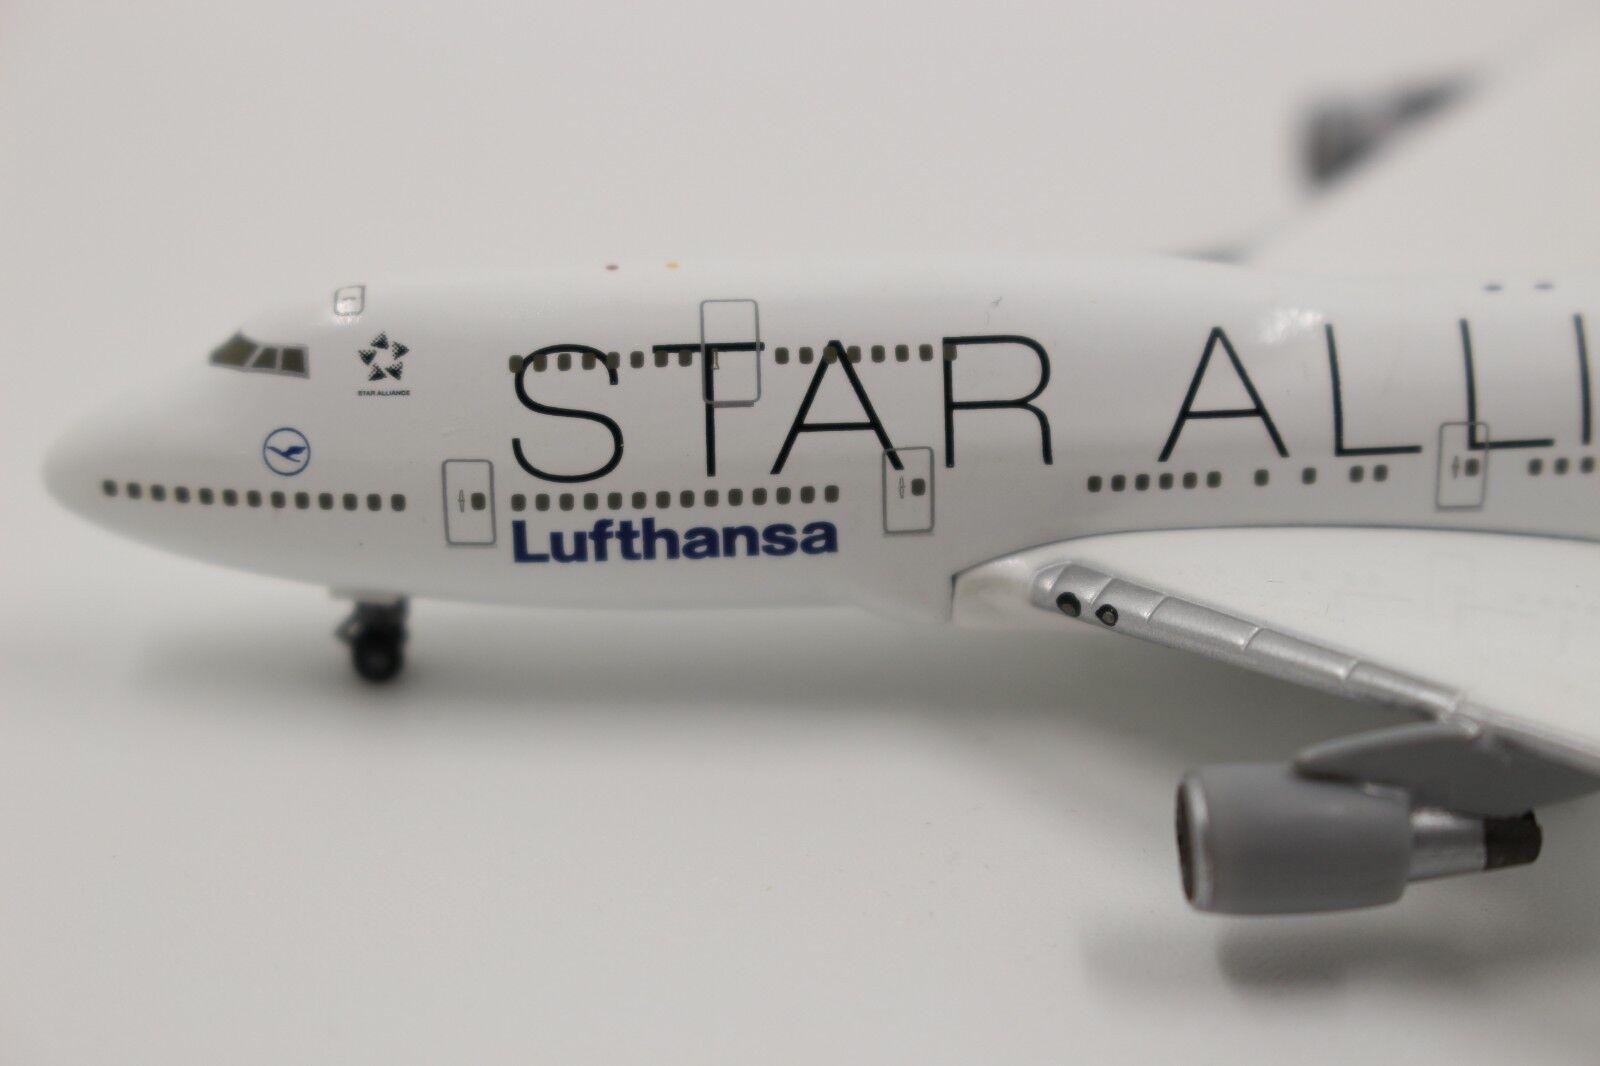 Herpa Wings 1 1 1 500 lufthansa boeing 747-400 Star Alliance Duisburg (504164) rar 392fad